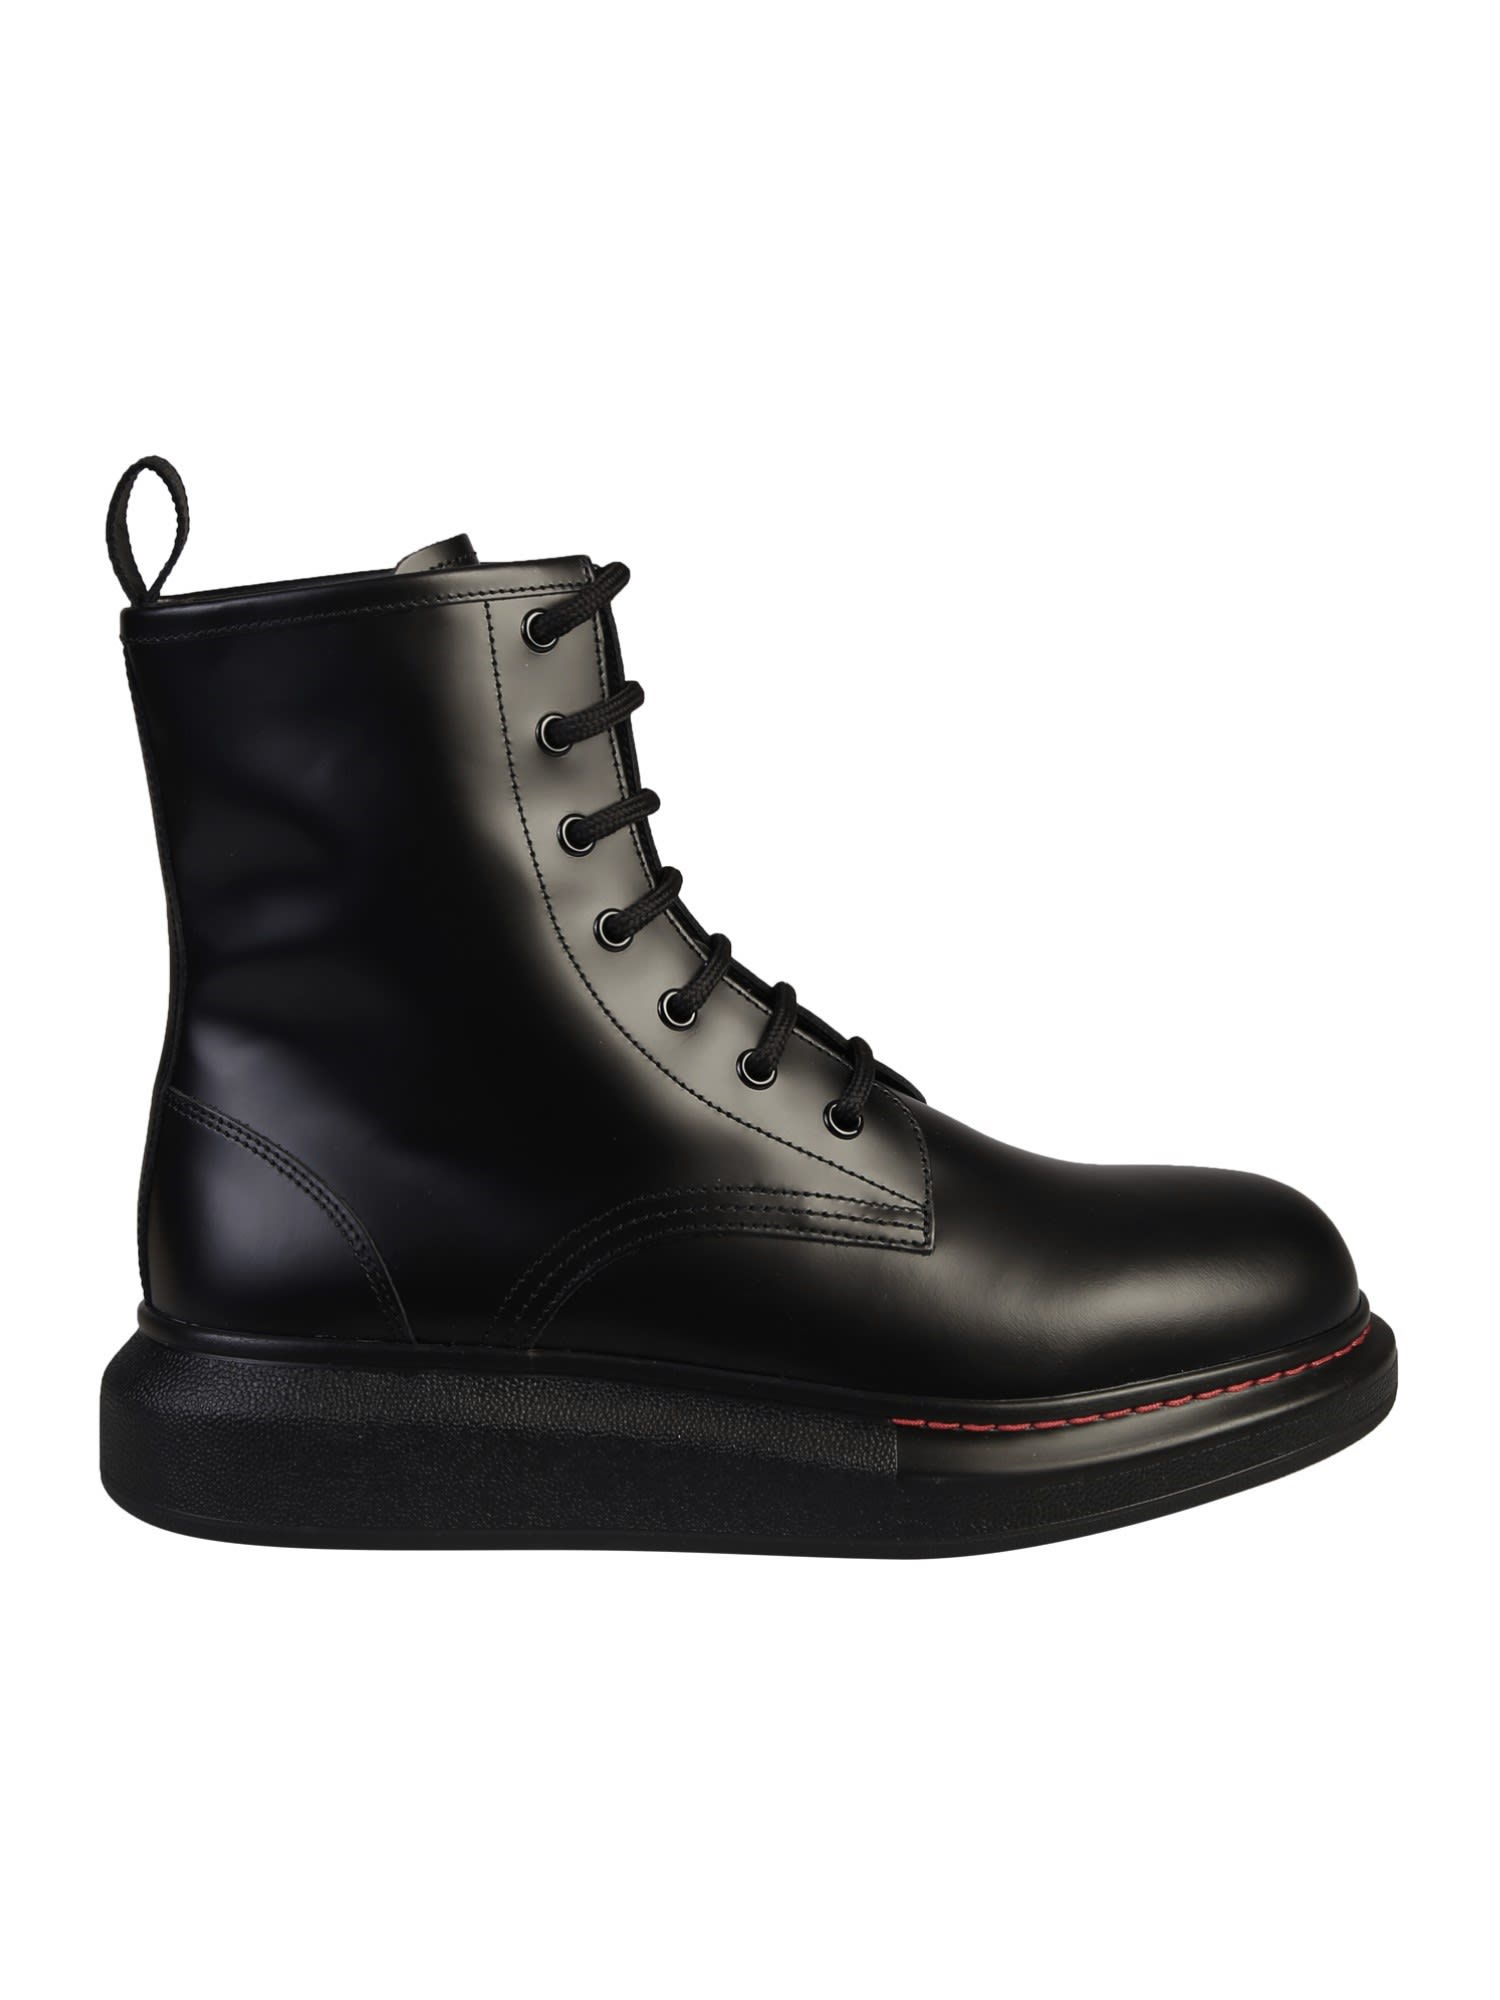 Buy Alexander McQueen Black Boots online, shop Alexander McQueen shoes with free shipping